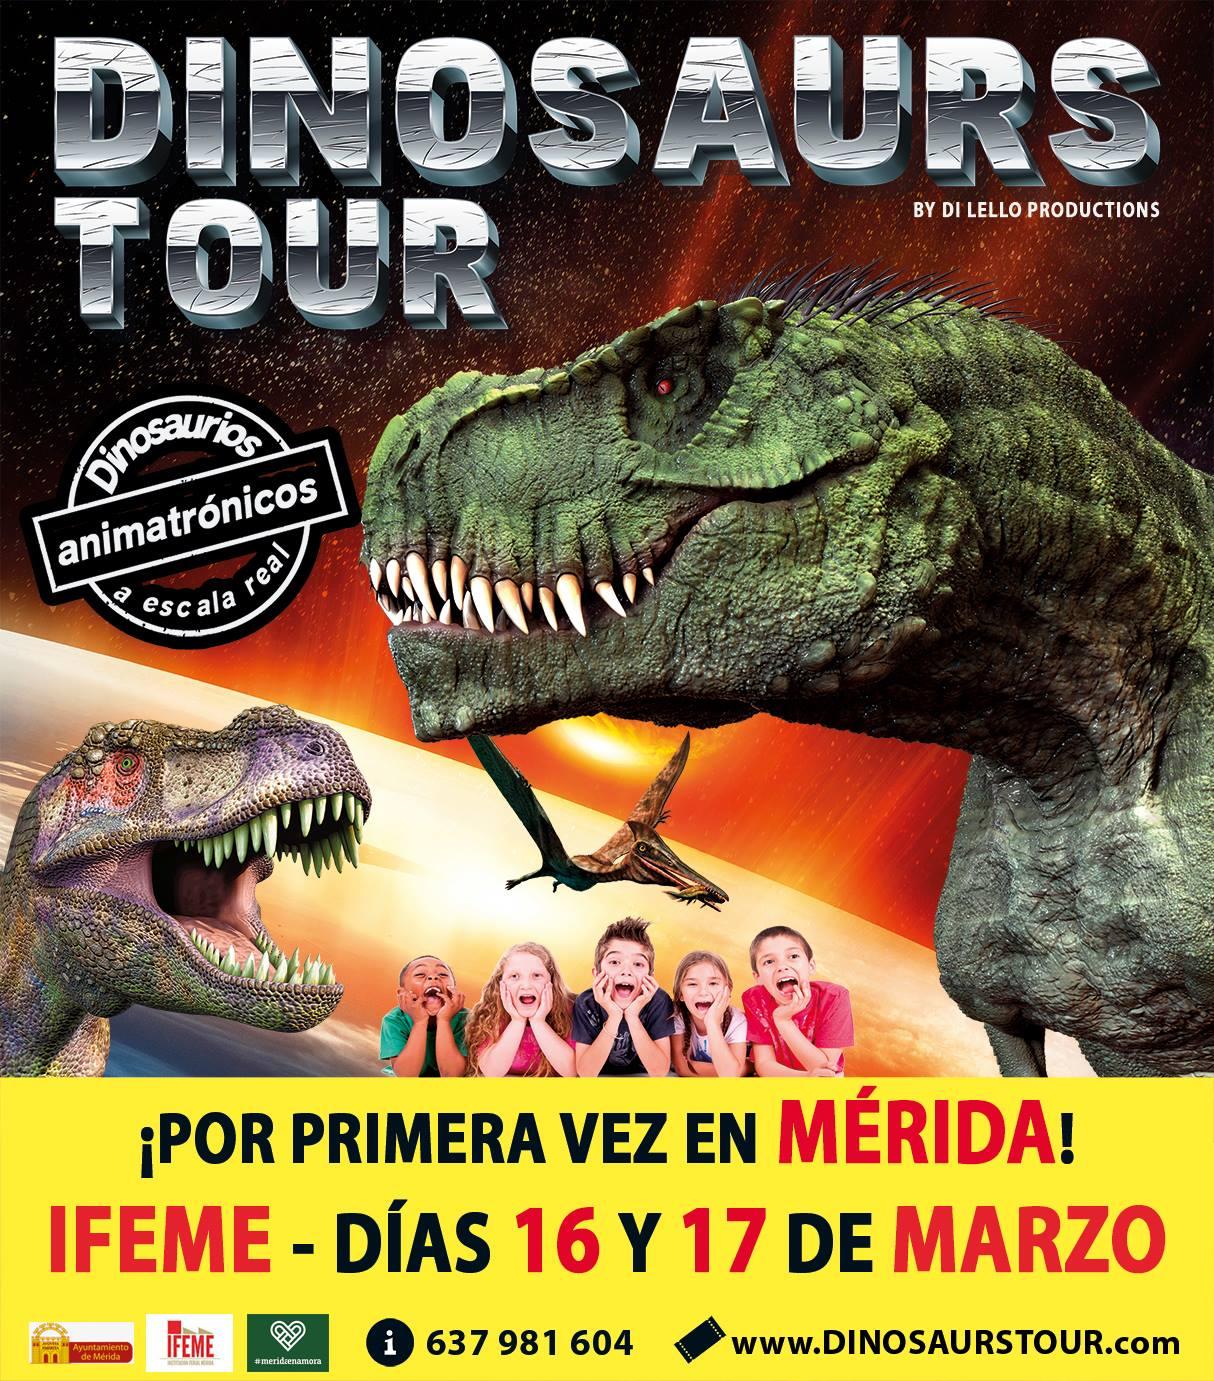 dinosaurios-cartel